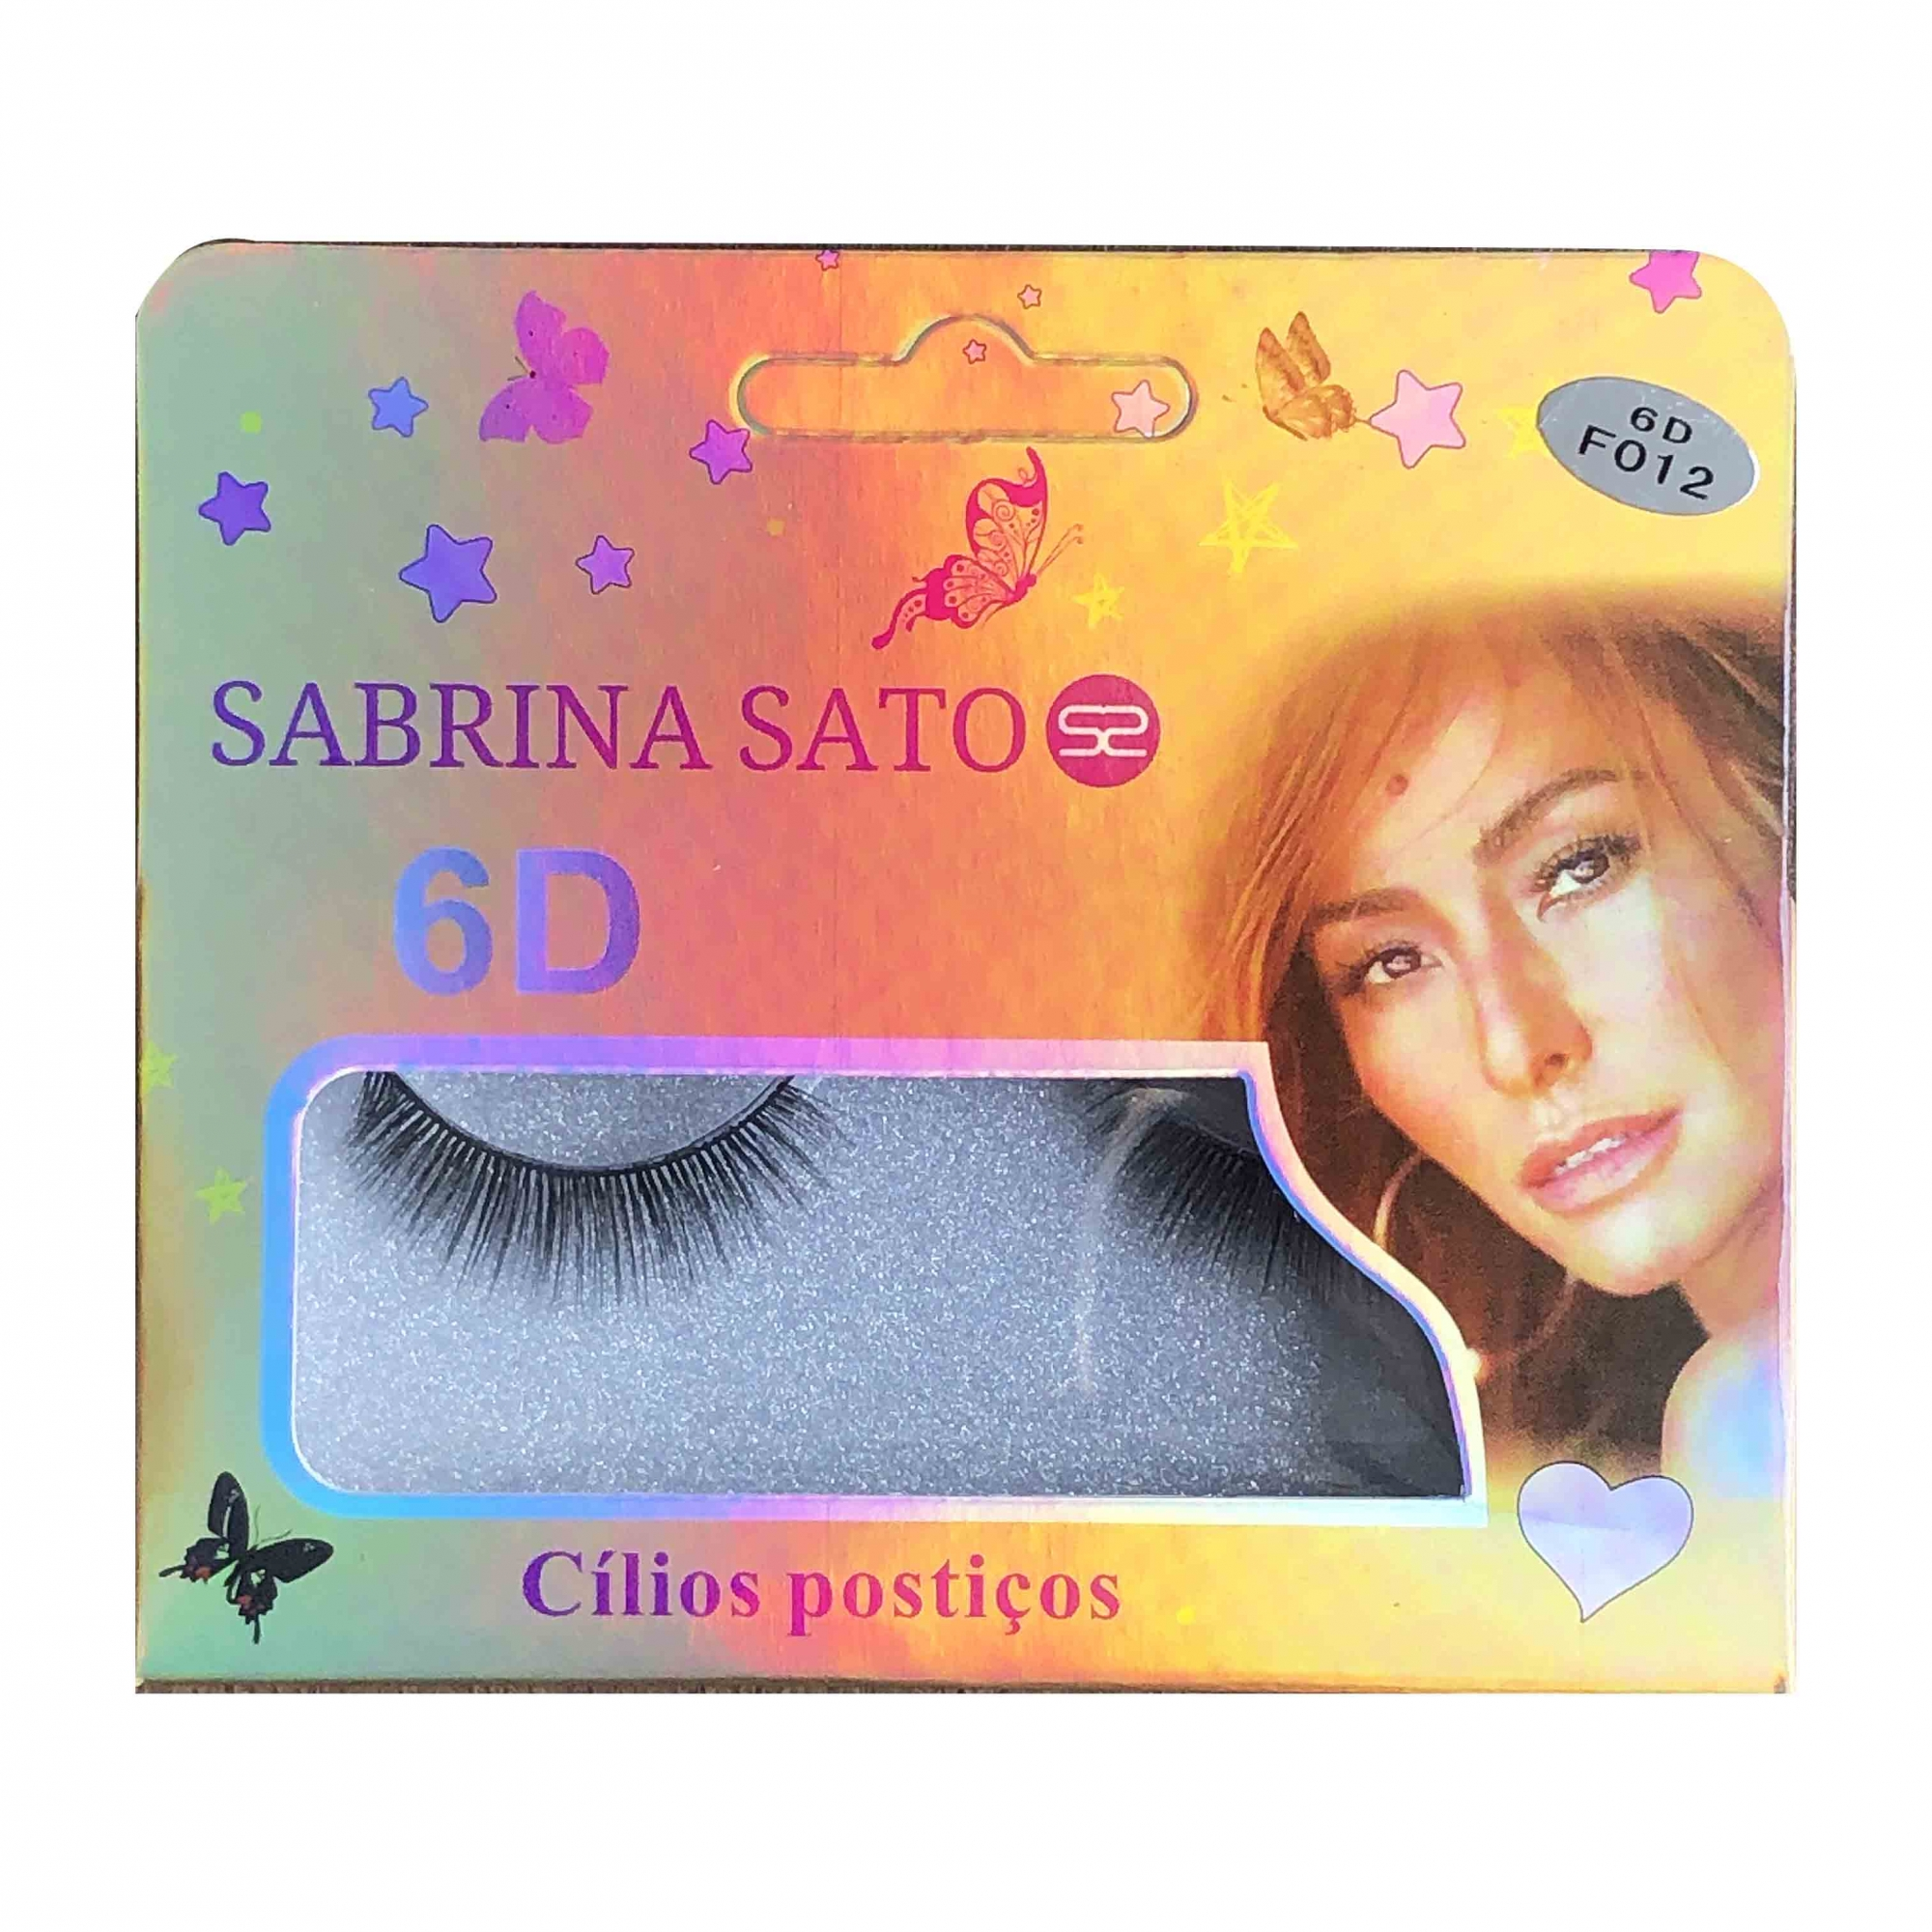 Sabrina Sato CÍLIOS POSTIÇOS 6D-F012